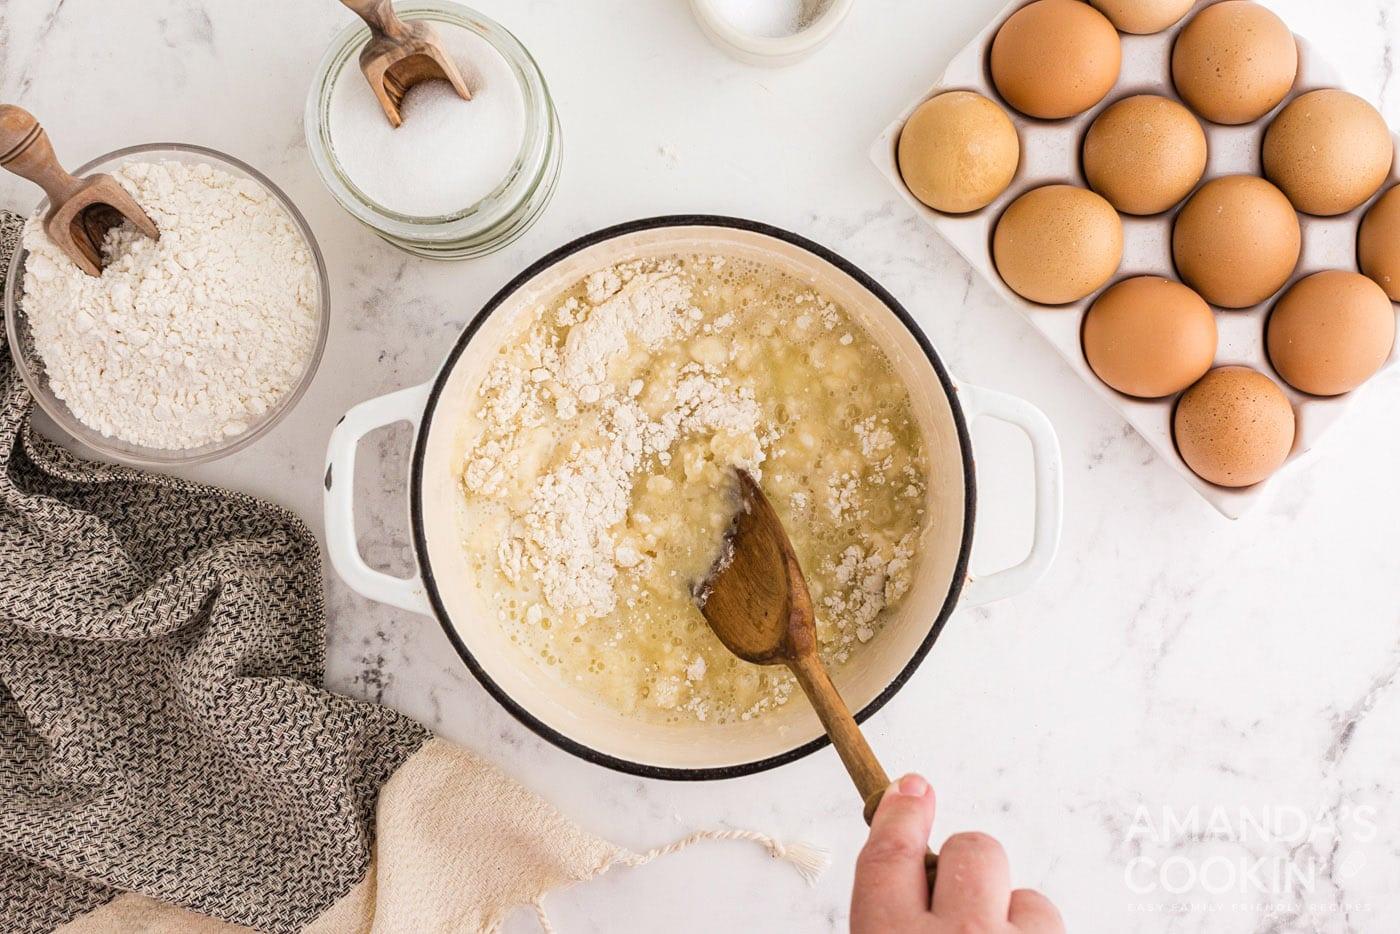 stirring flour into butter mixture in saucepan